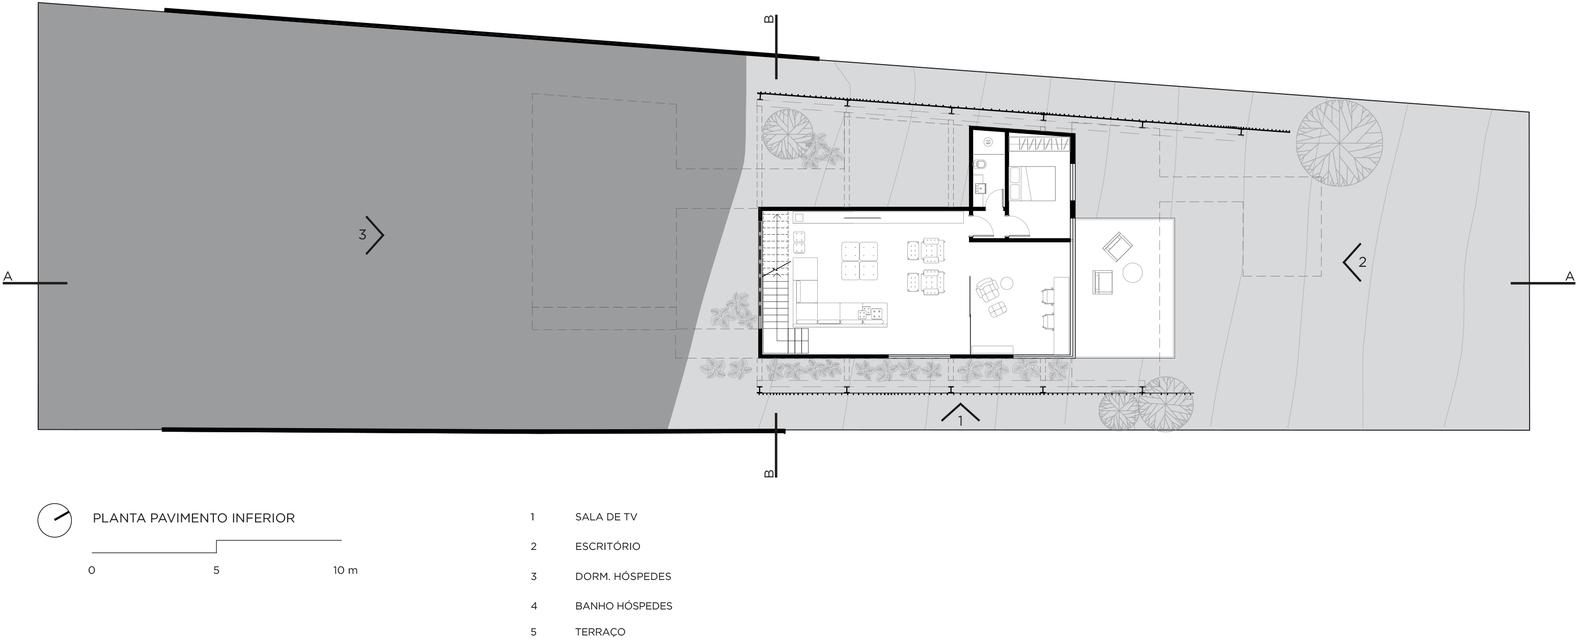 Gallery of mirante house fgmf arquitetos 26 mirante houselower floor plan ccuart Gallery